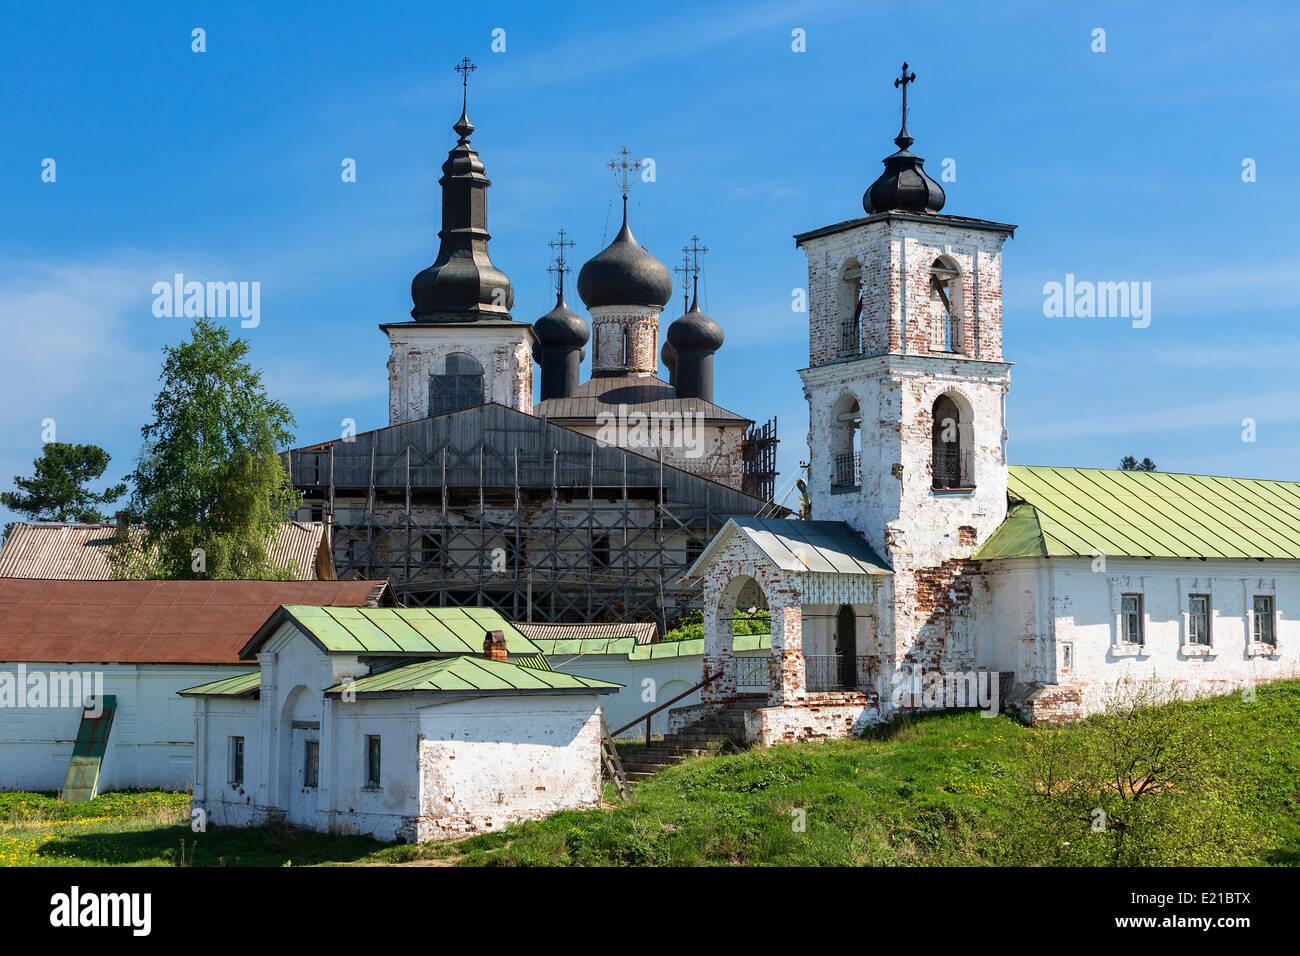 The Goritsky Monastery of Resurrection Volga Baltic - Stock Image